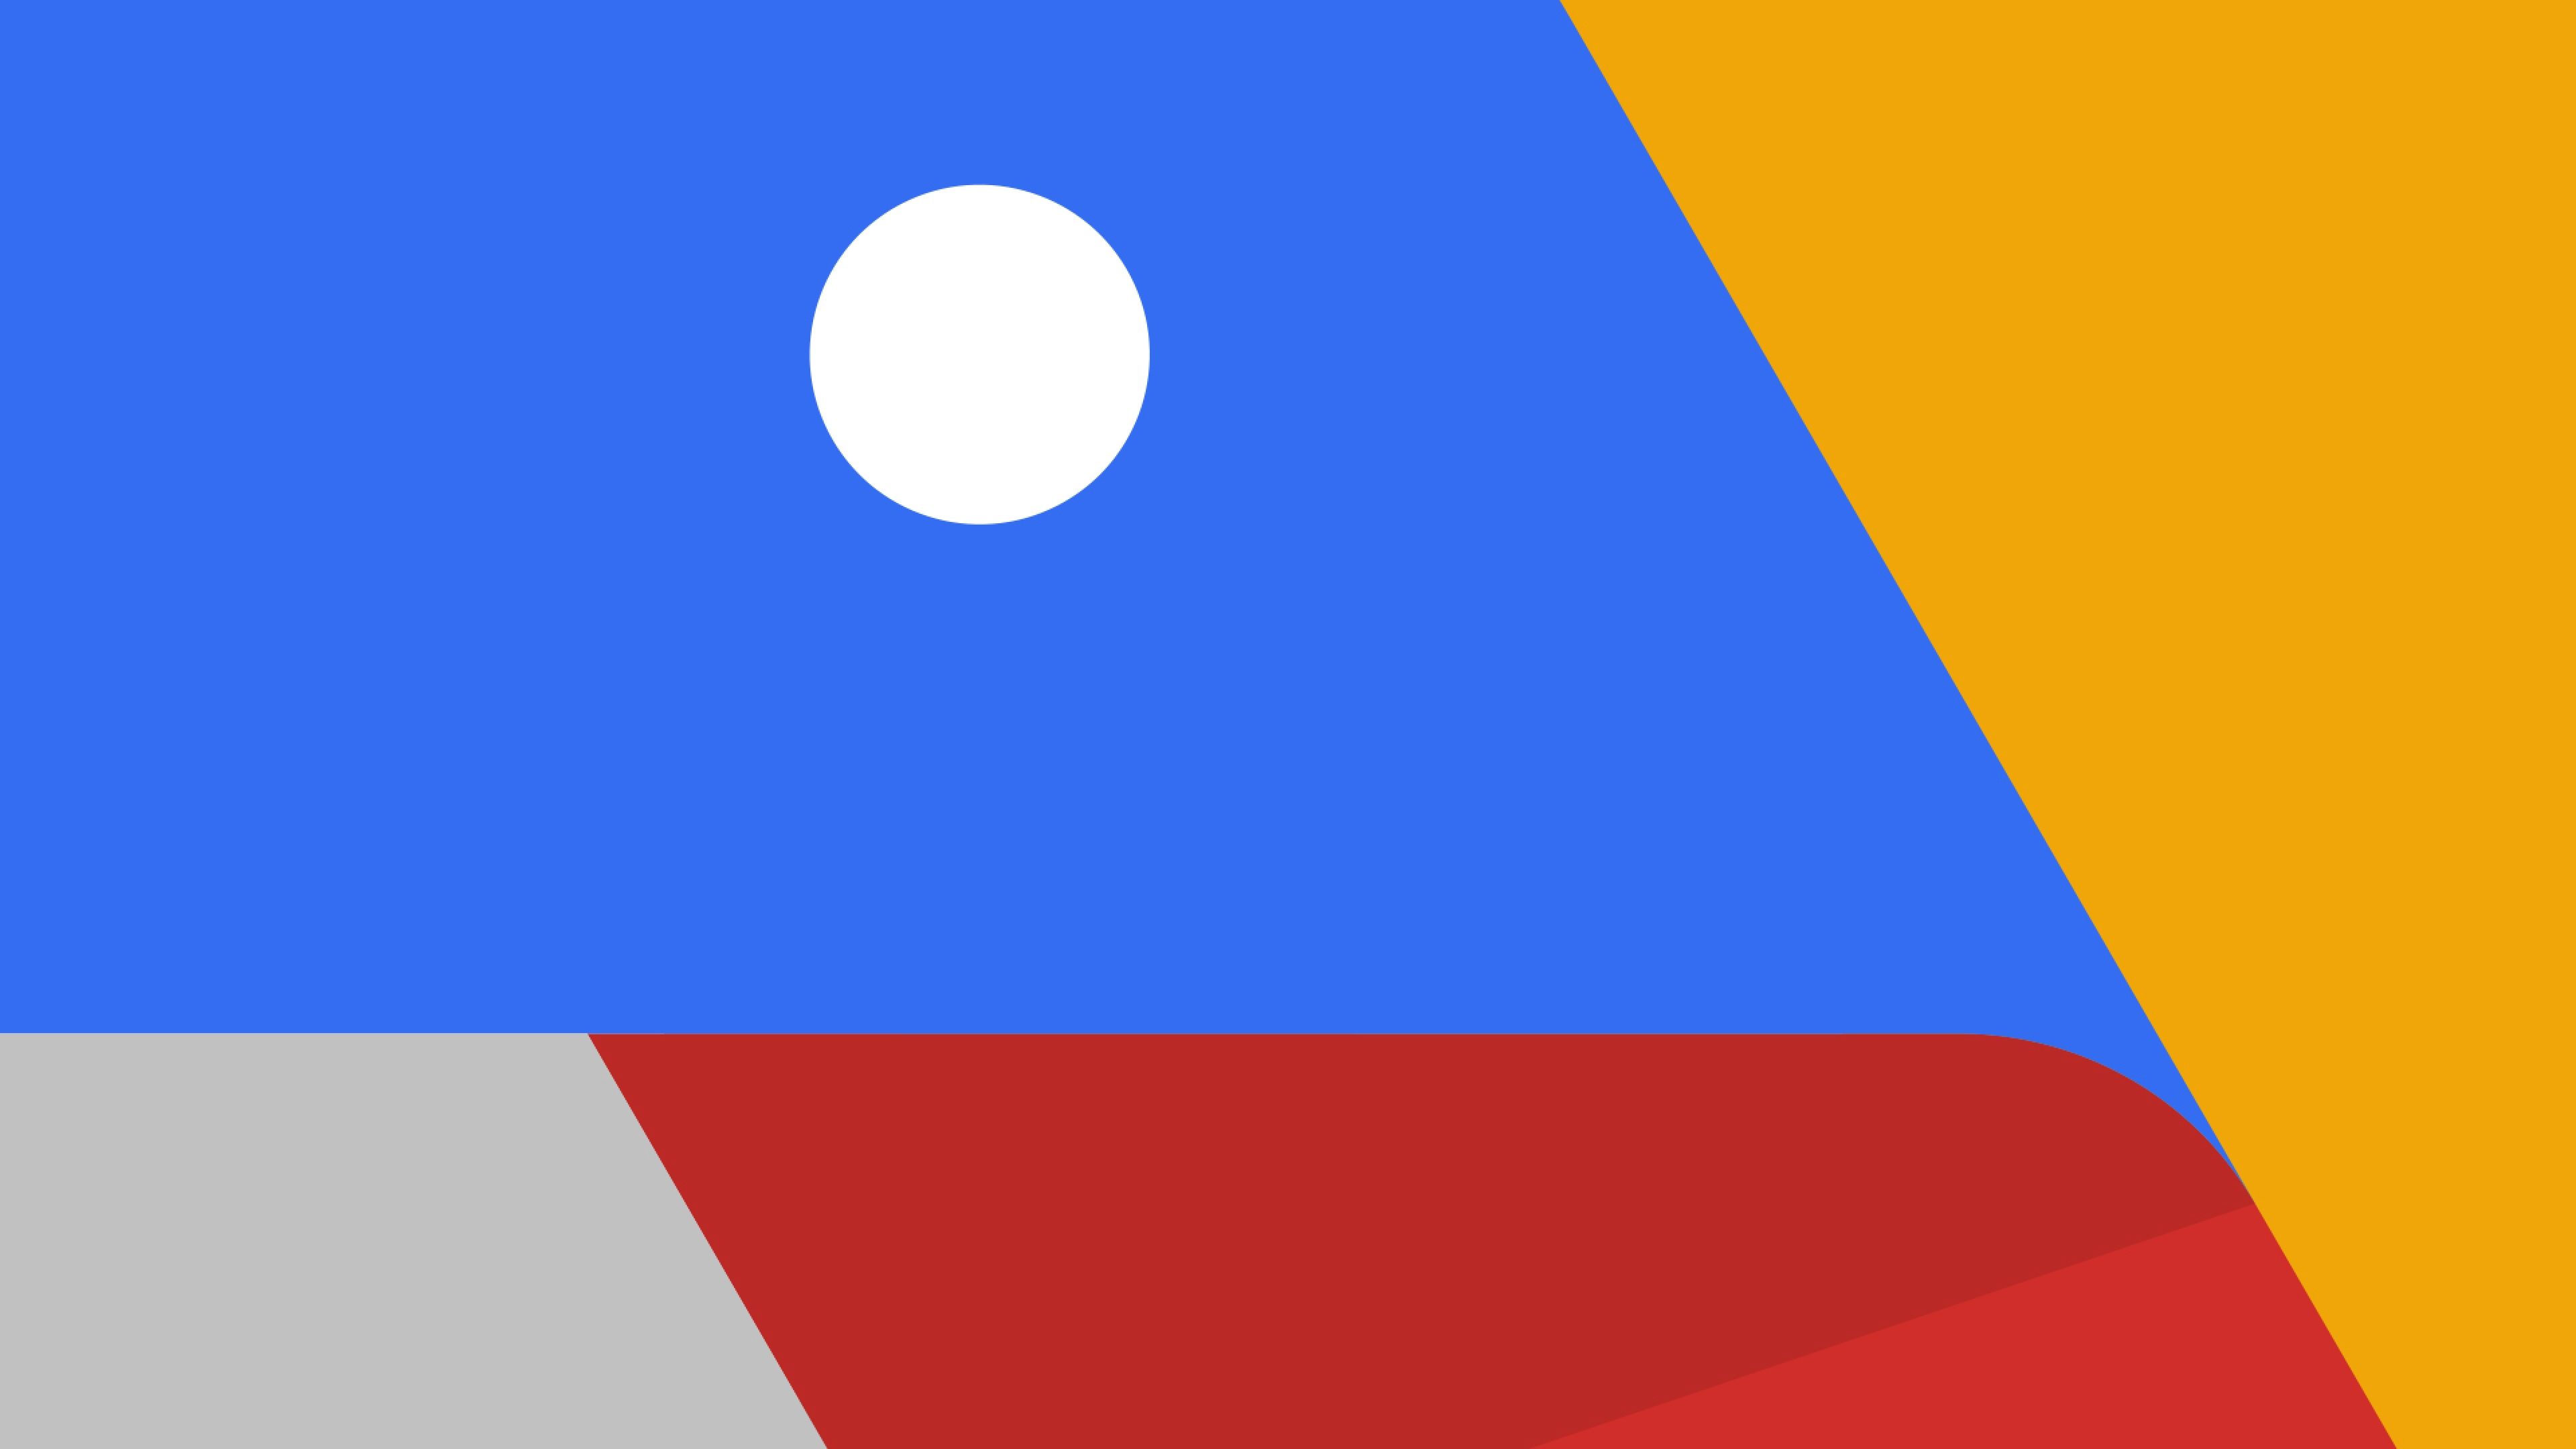 Google Cloud Logo 4k Hd Logo 4k Wallpapers Images Backgrounds